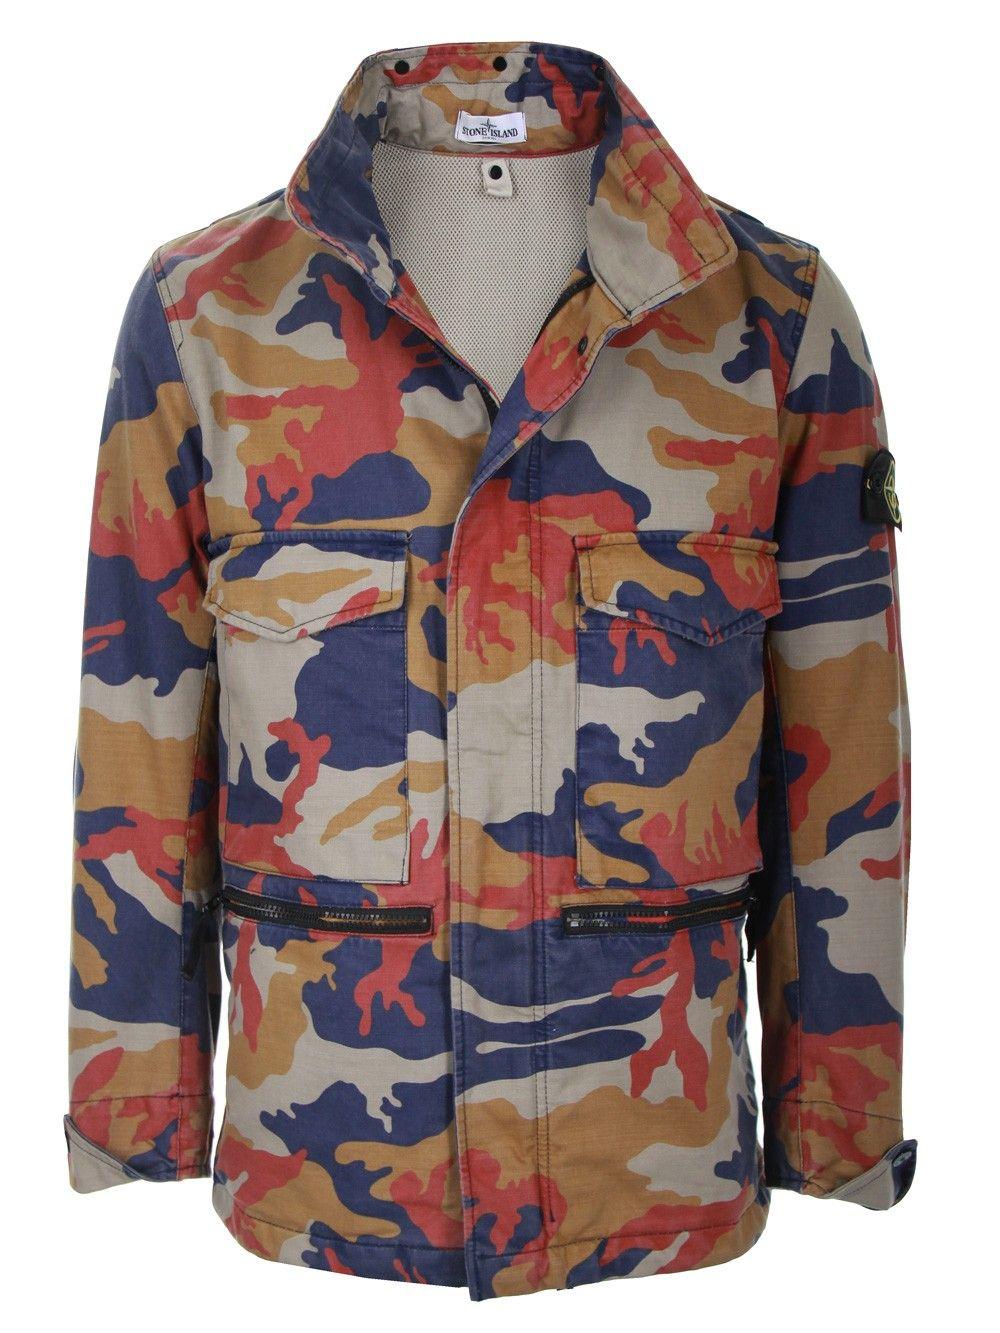 Stone Island Jacket Camouflage Lederjacke Manner Taktische Kleidung Manner Outfit